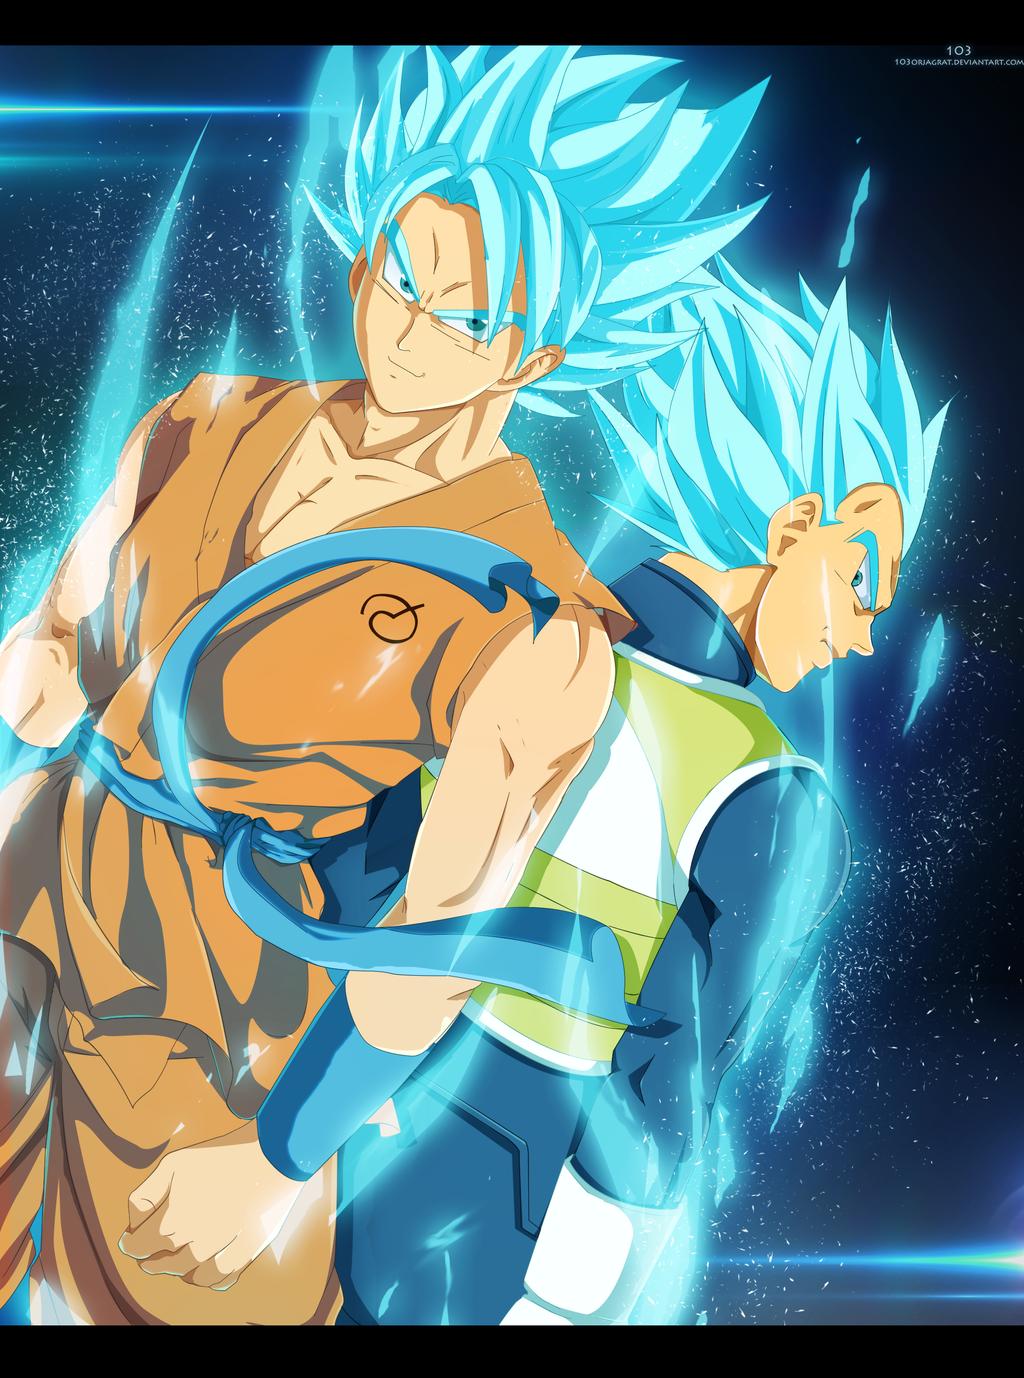 Goku And Vegeta super saiyan GODS by The-103